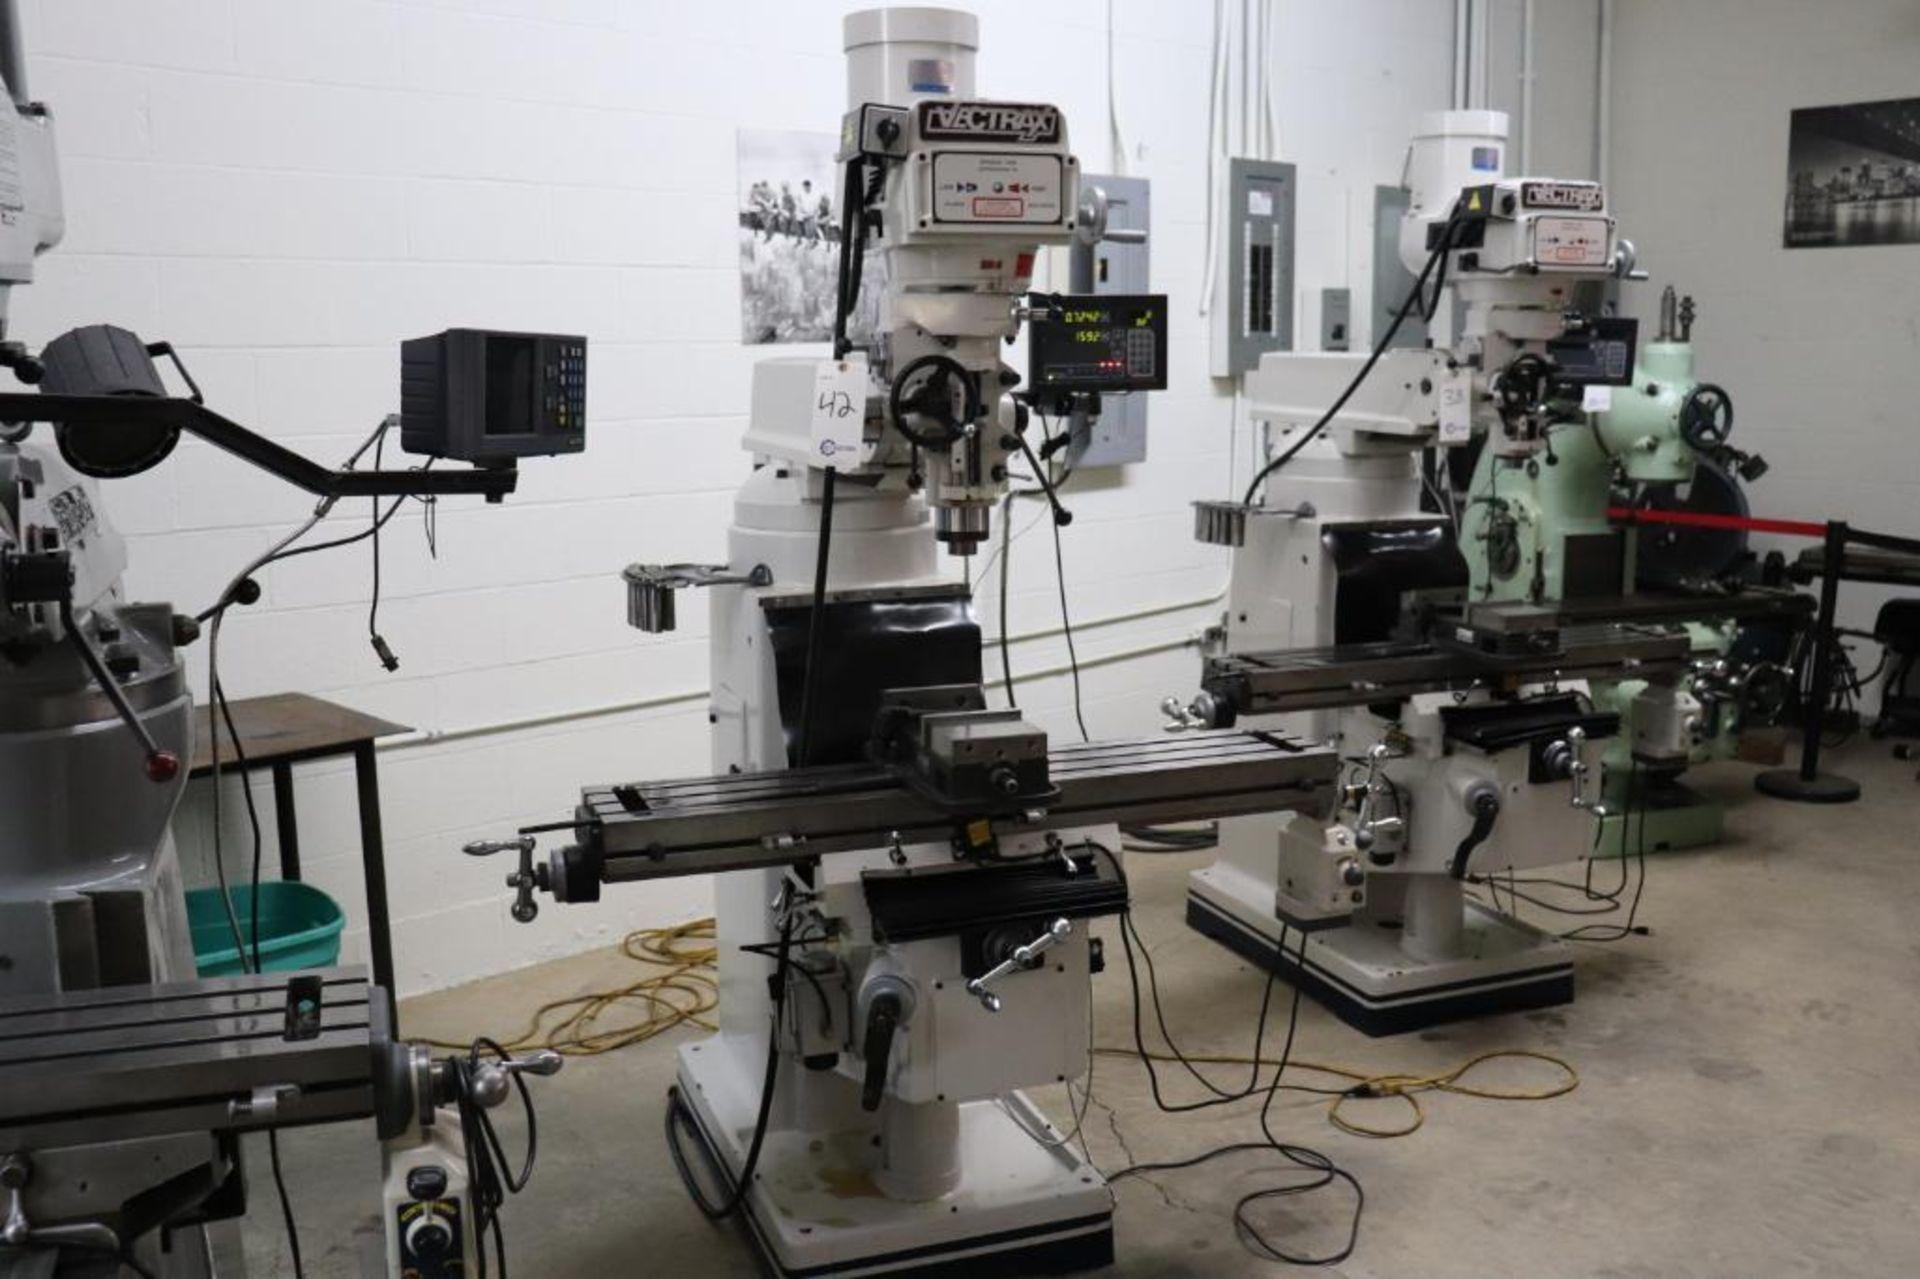 Vectrax GS16V vertical milling machine w/ Newall DP700 DRO9